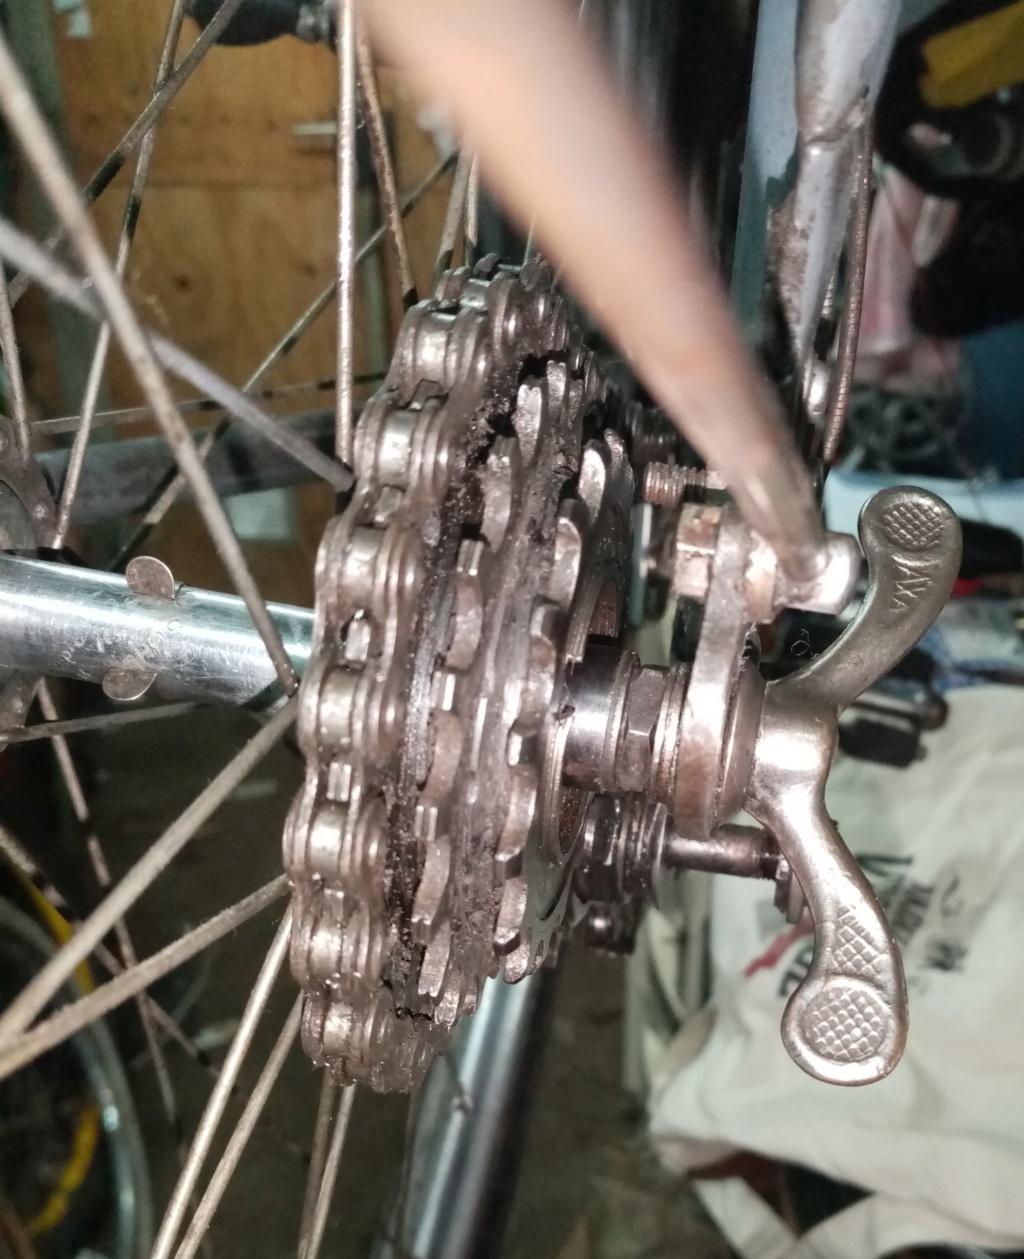 vélo mixte 1937-39 ROYAL FABRIC  3v CYCLO  02122